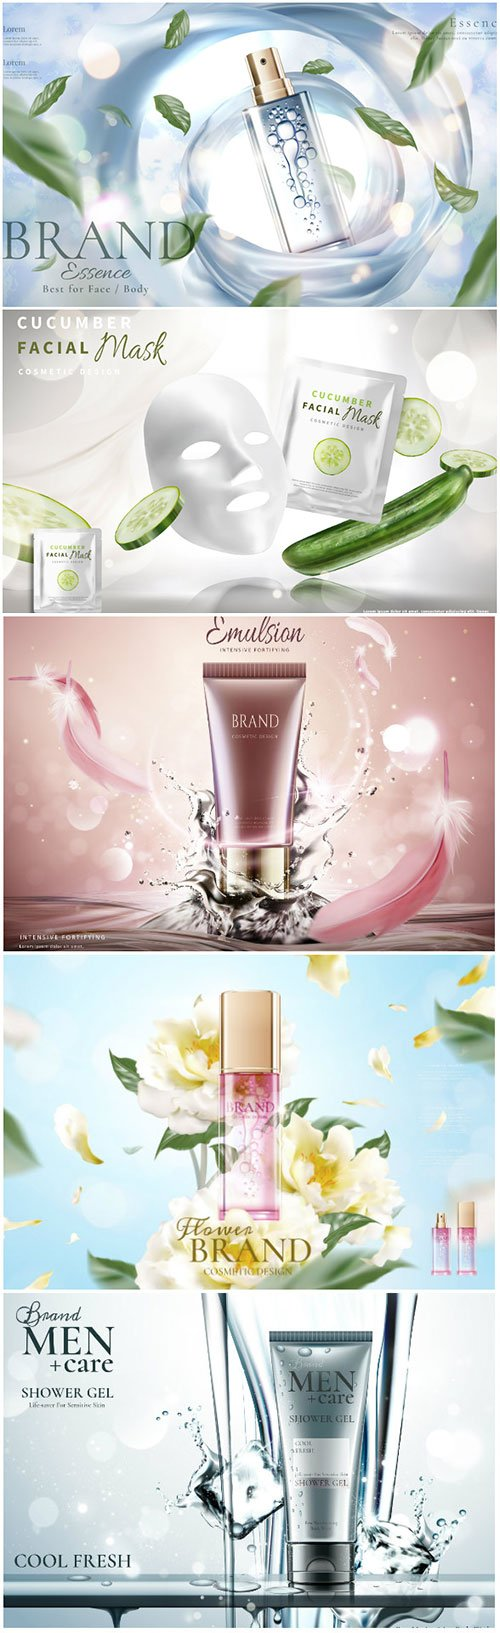 Skincare Banner Ads In 3d Vector Illustration Nitrogfx Download Unique Graphics For Creative Designers